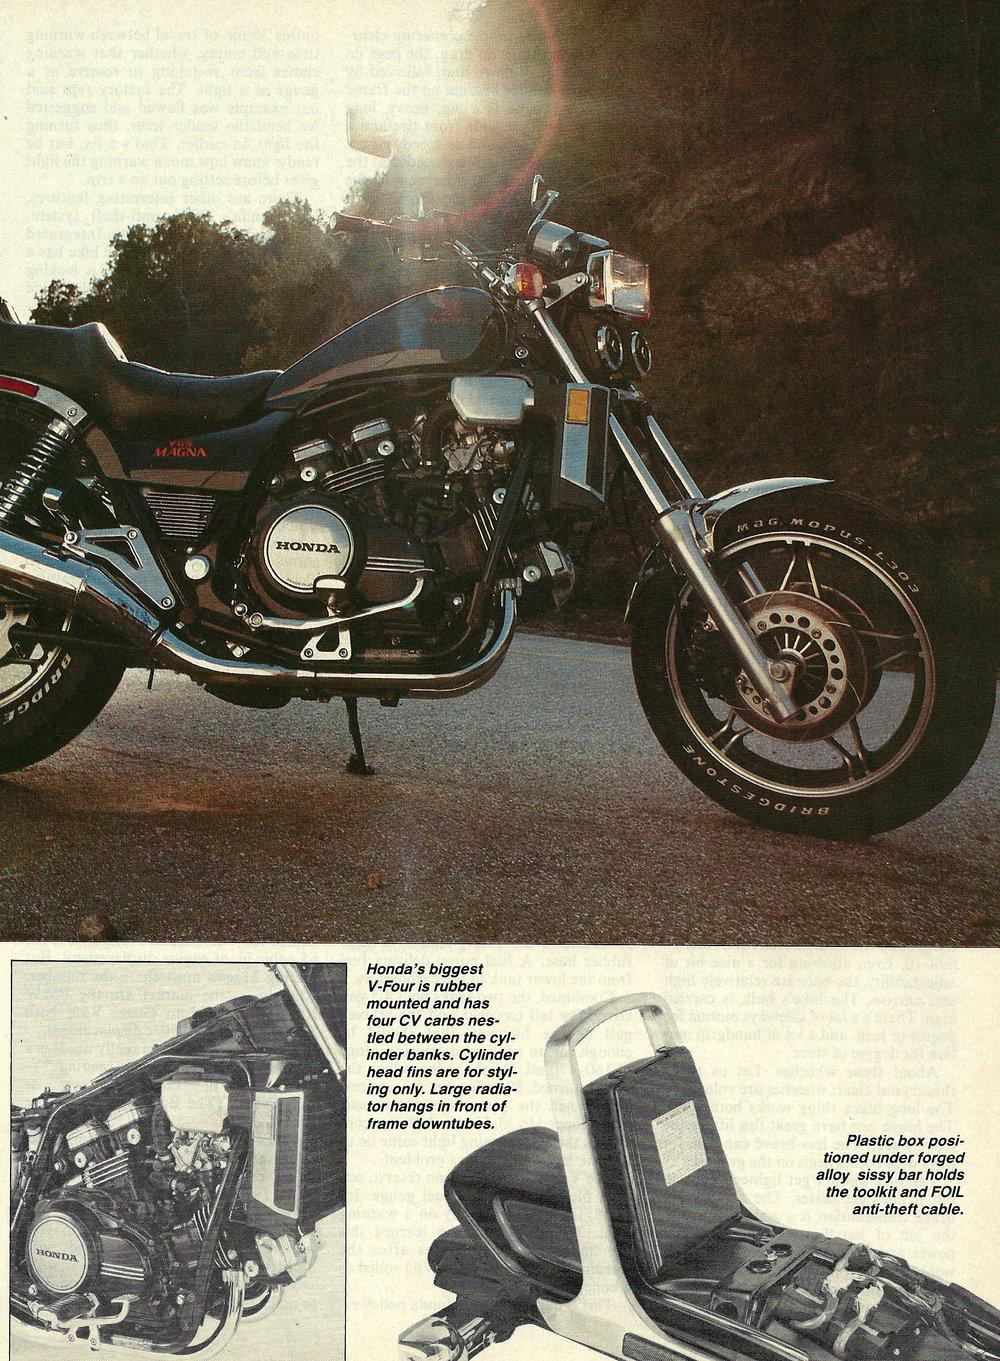 1983 Honda V65 Magna 06.jpg